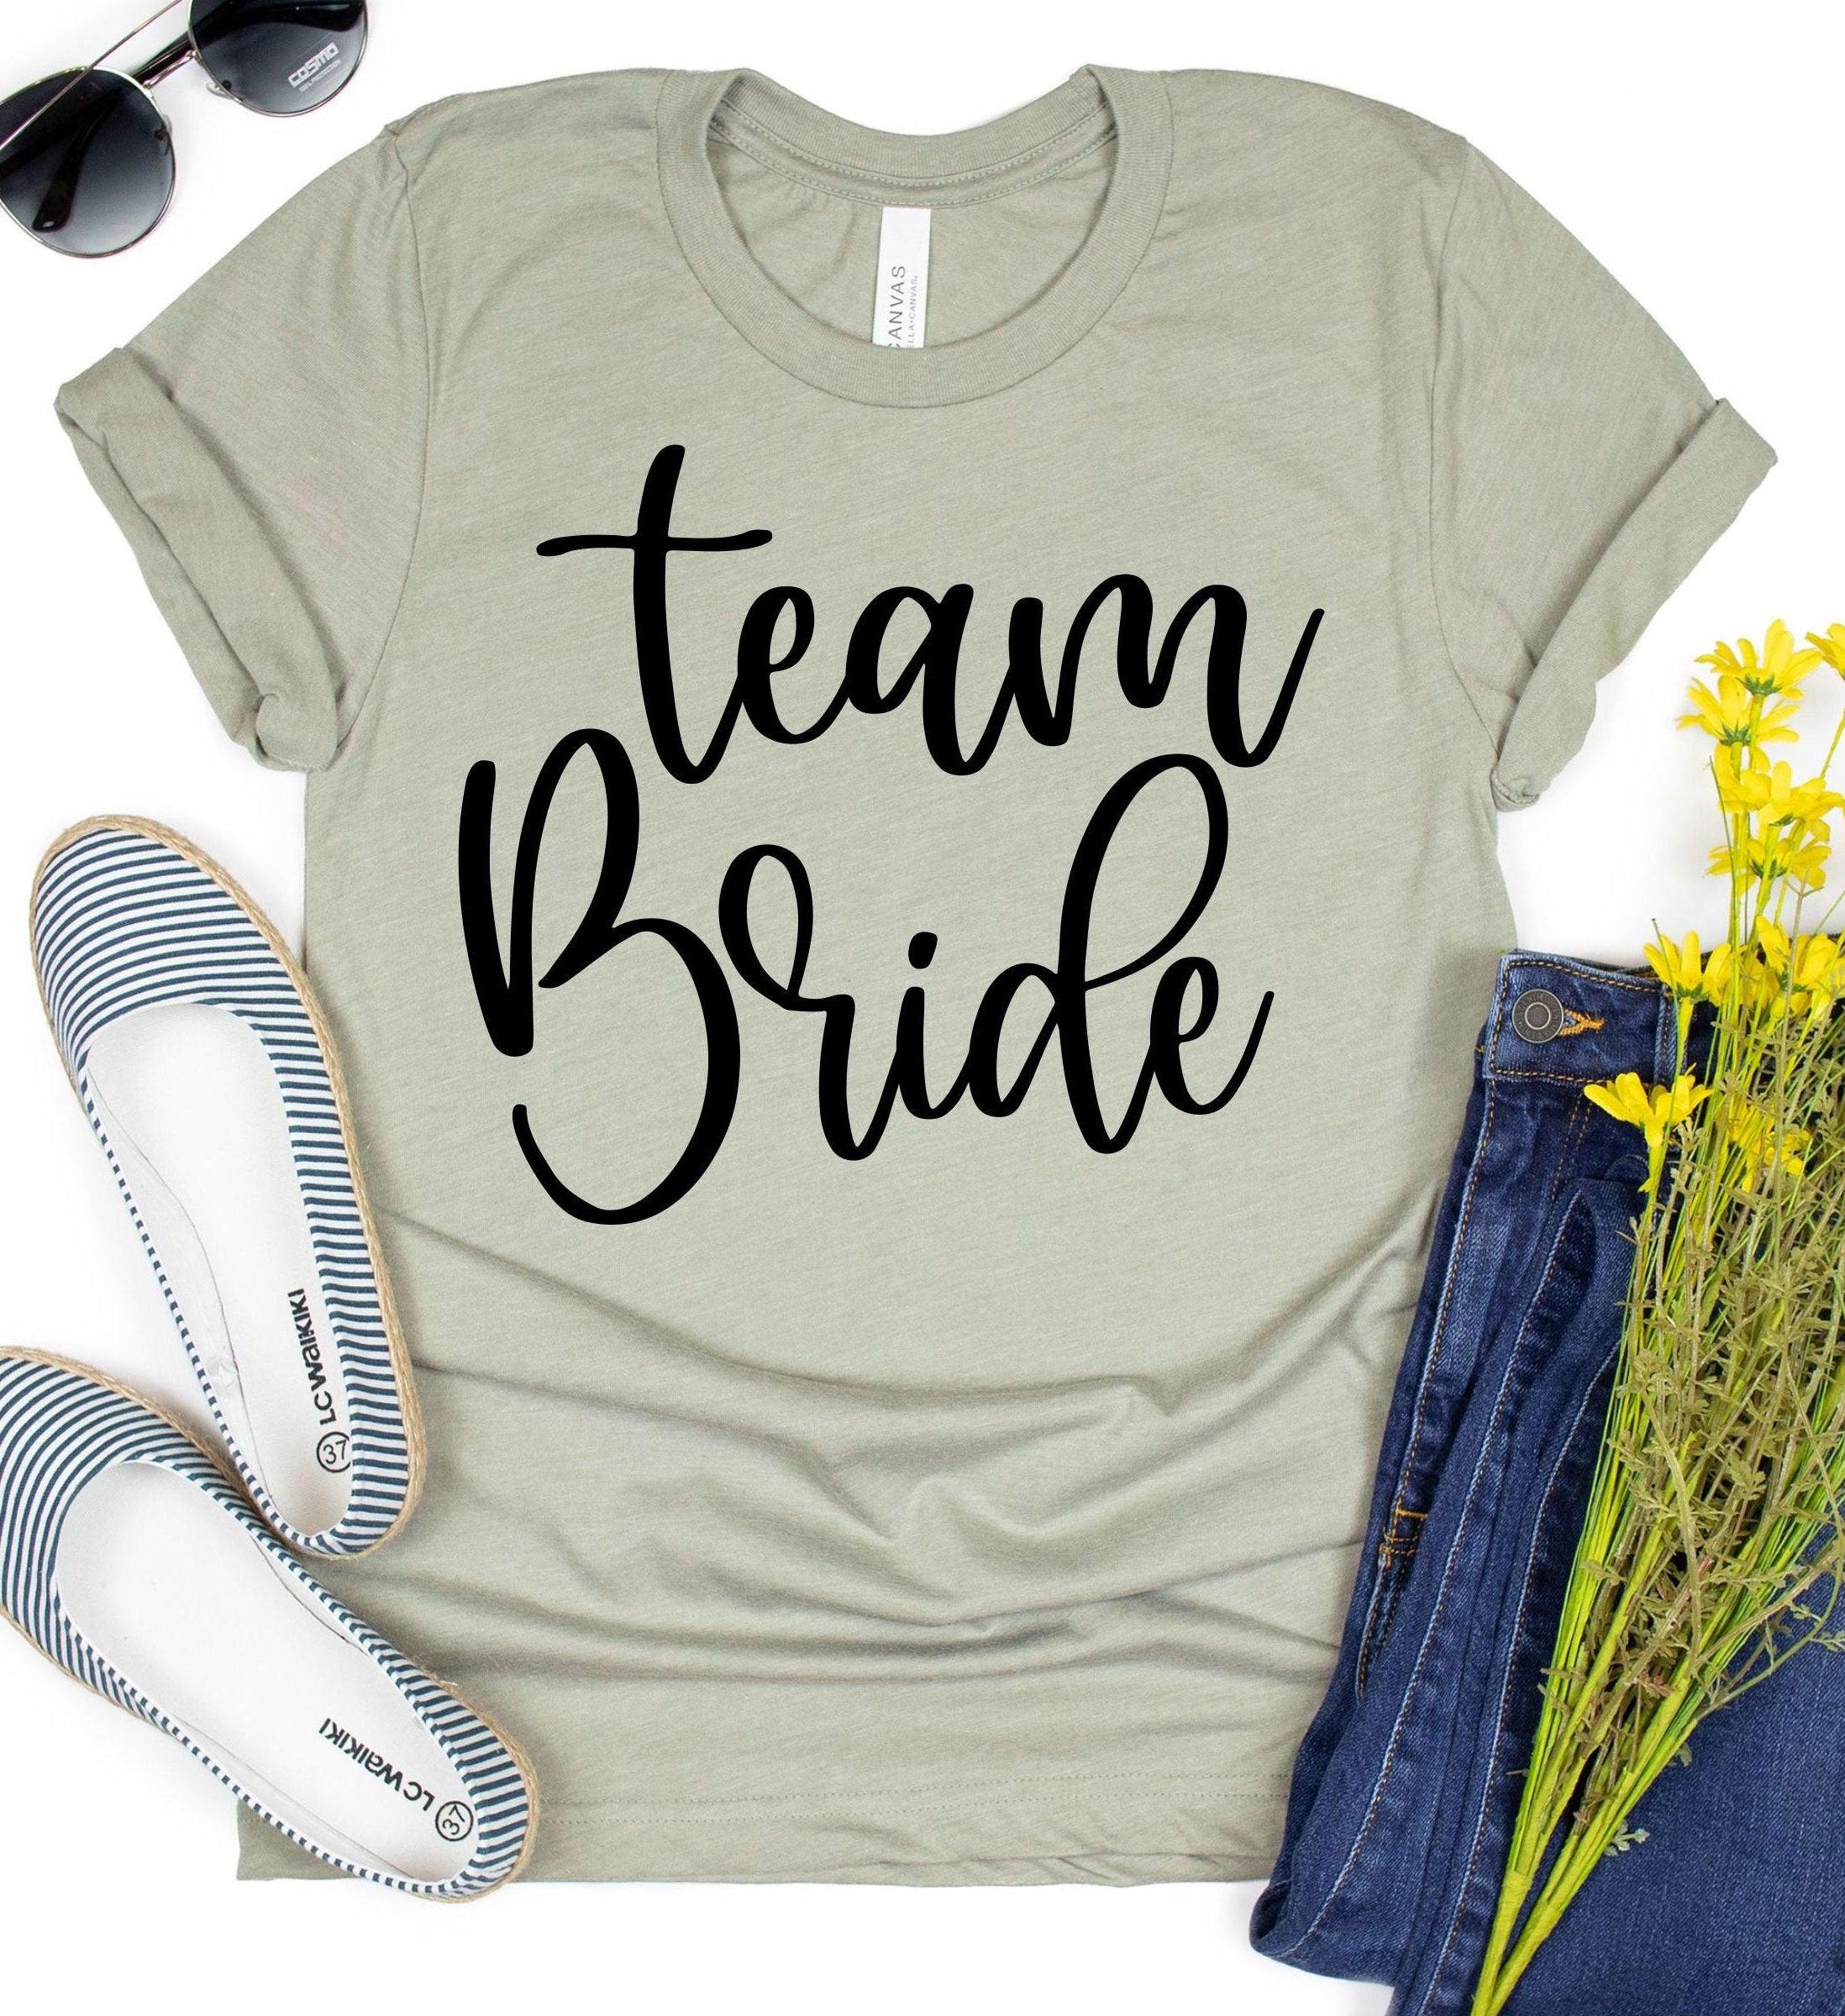 Team-bride-svg-matron-svg-bridesmaid-svg-bridal-party-svg-wedding-svg-design-bachelorette-svg-design-bridesmaid-cricut-svg-600a1660